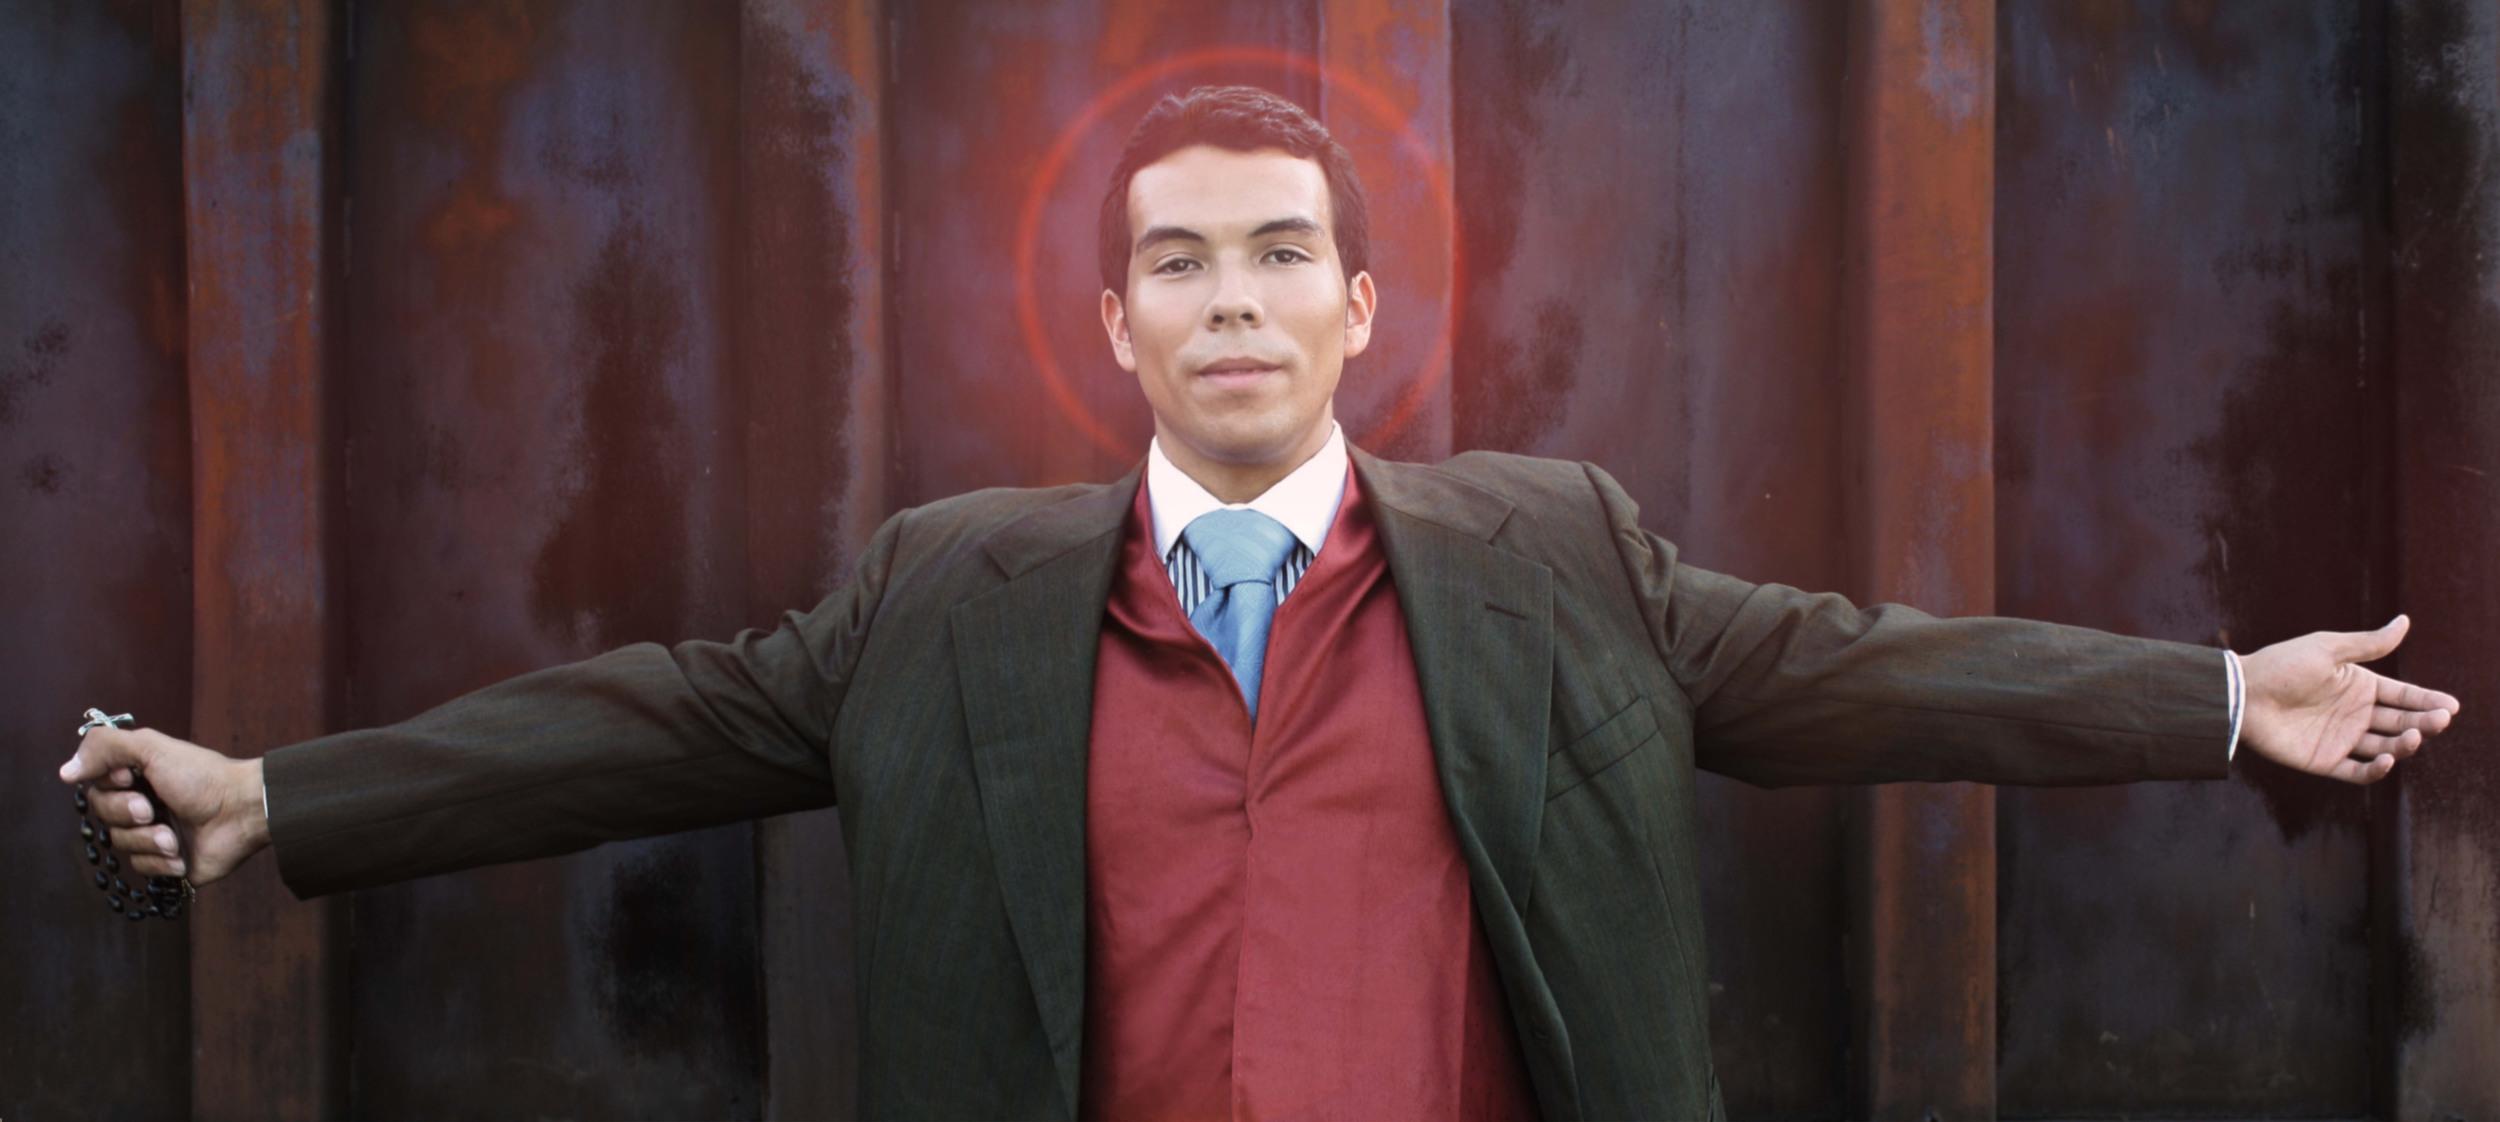 ¡Viva Cristo Rey! Miguel Pro